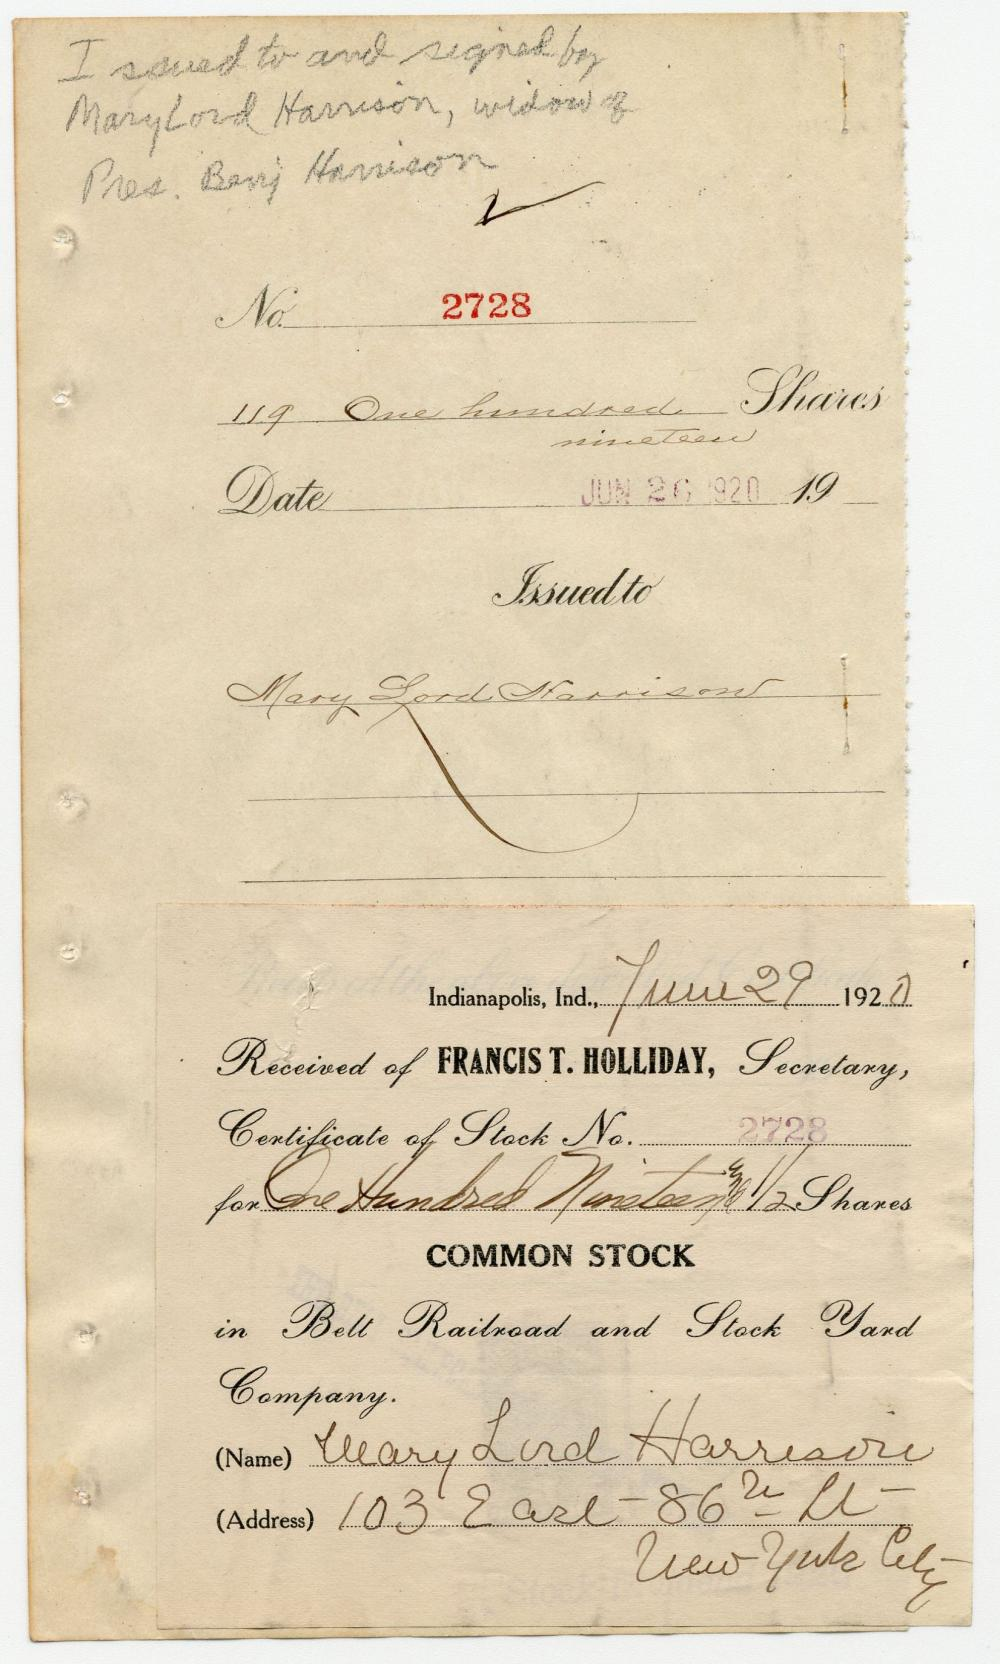 Benjamin Harrison's Female Relatives Invest in Indianapolis Railroad & Stockyard